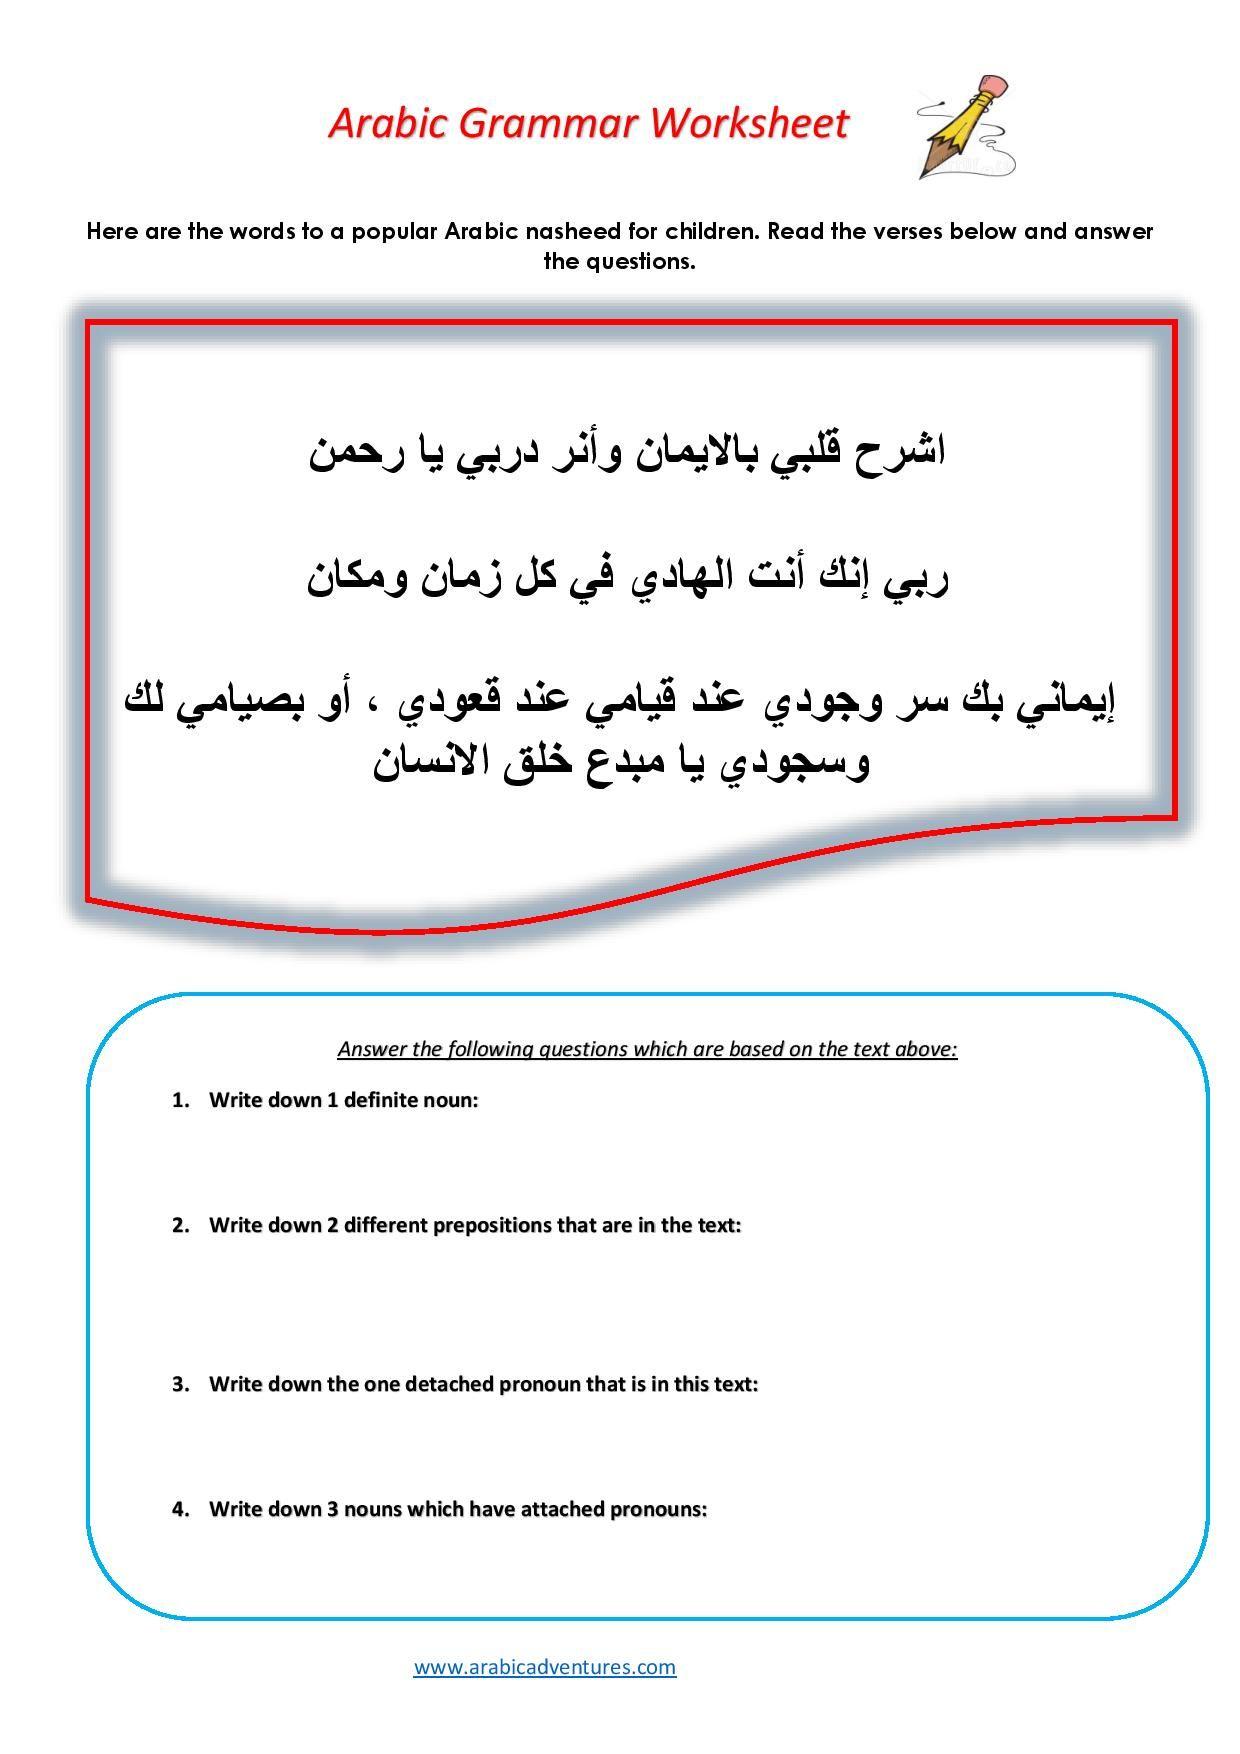 Arabic Grammar Review Worksheet Using A Popular Nasheed For Children In Arabic Get The Free Pdf At Www Arabicadventures Com Islamic Studies Worksheets Pin [ 1754 x 1240 Pixel ]